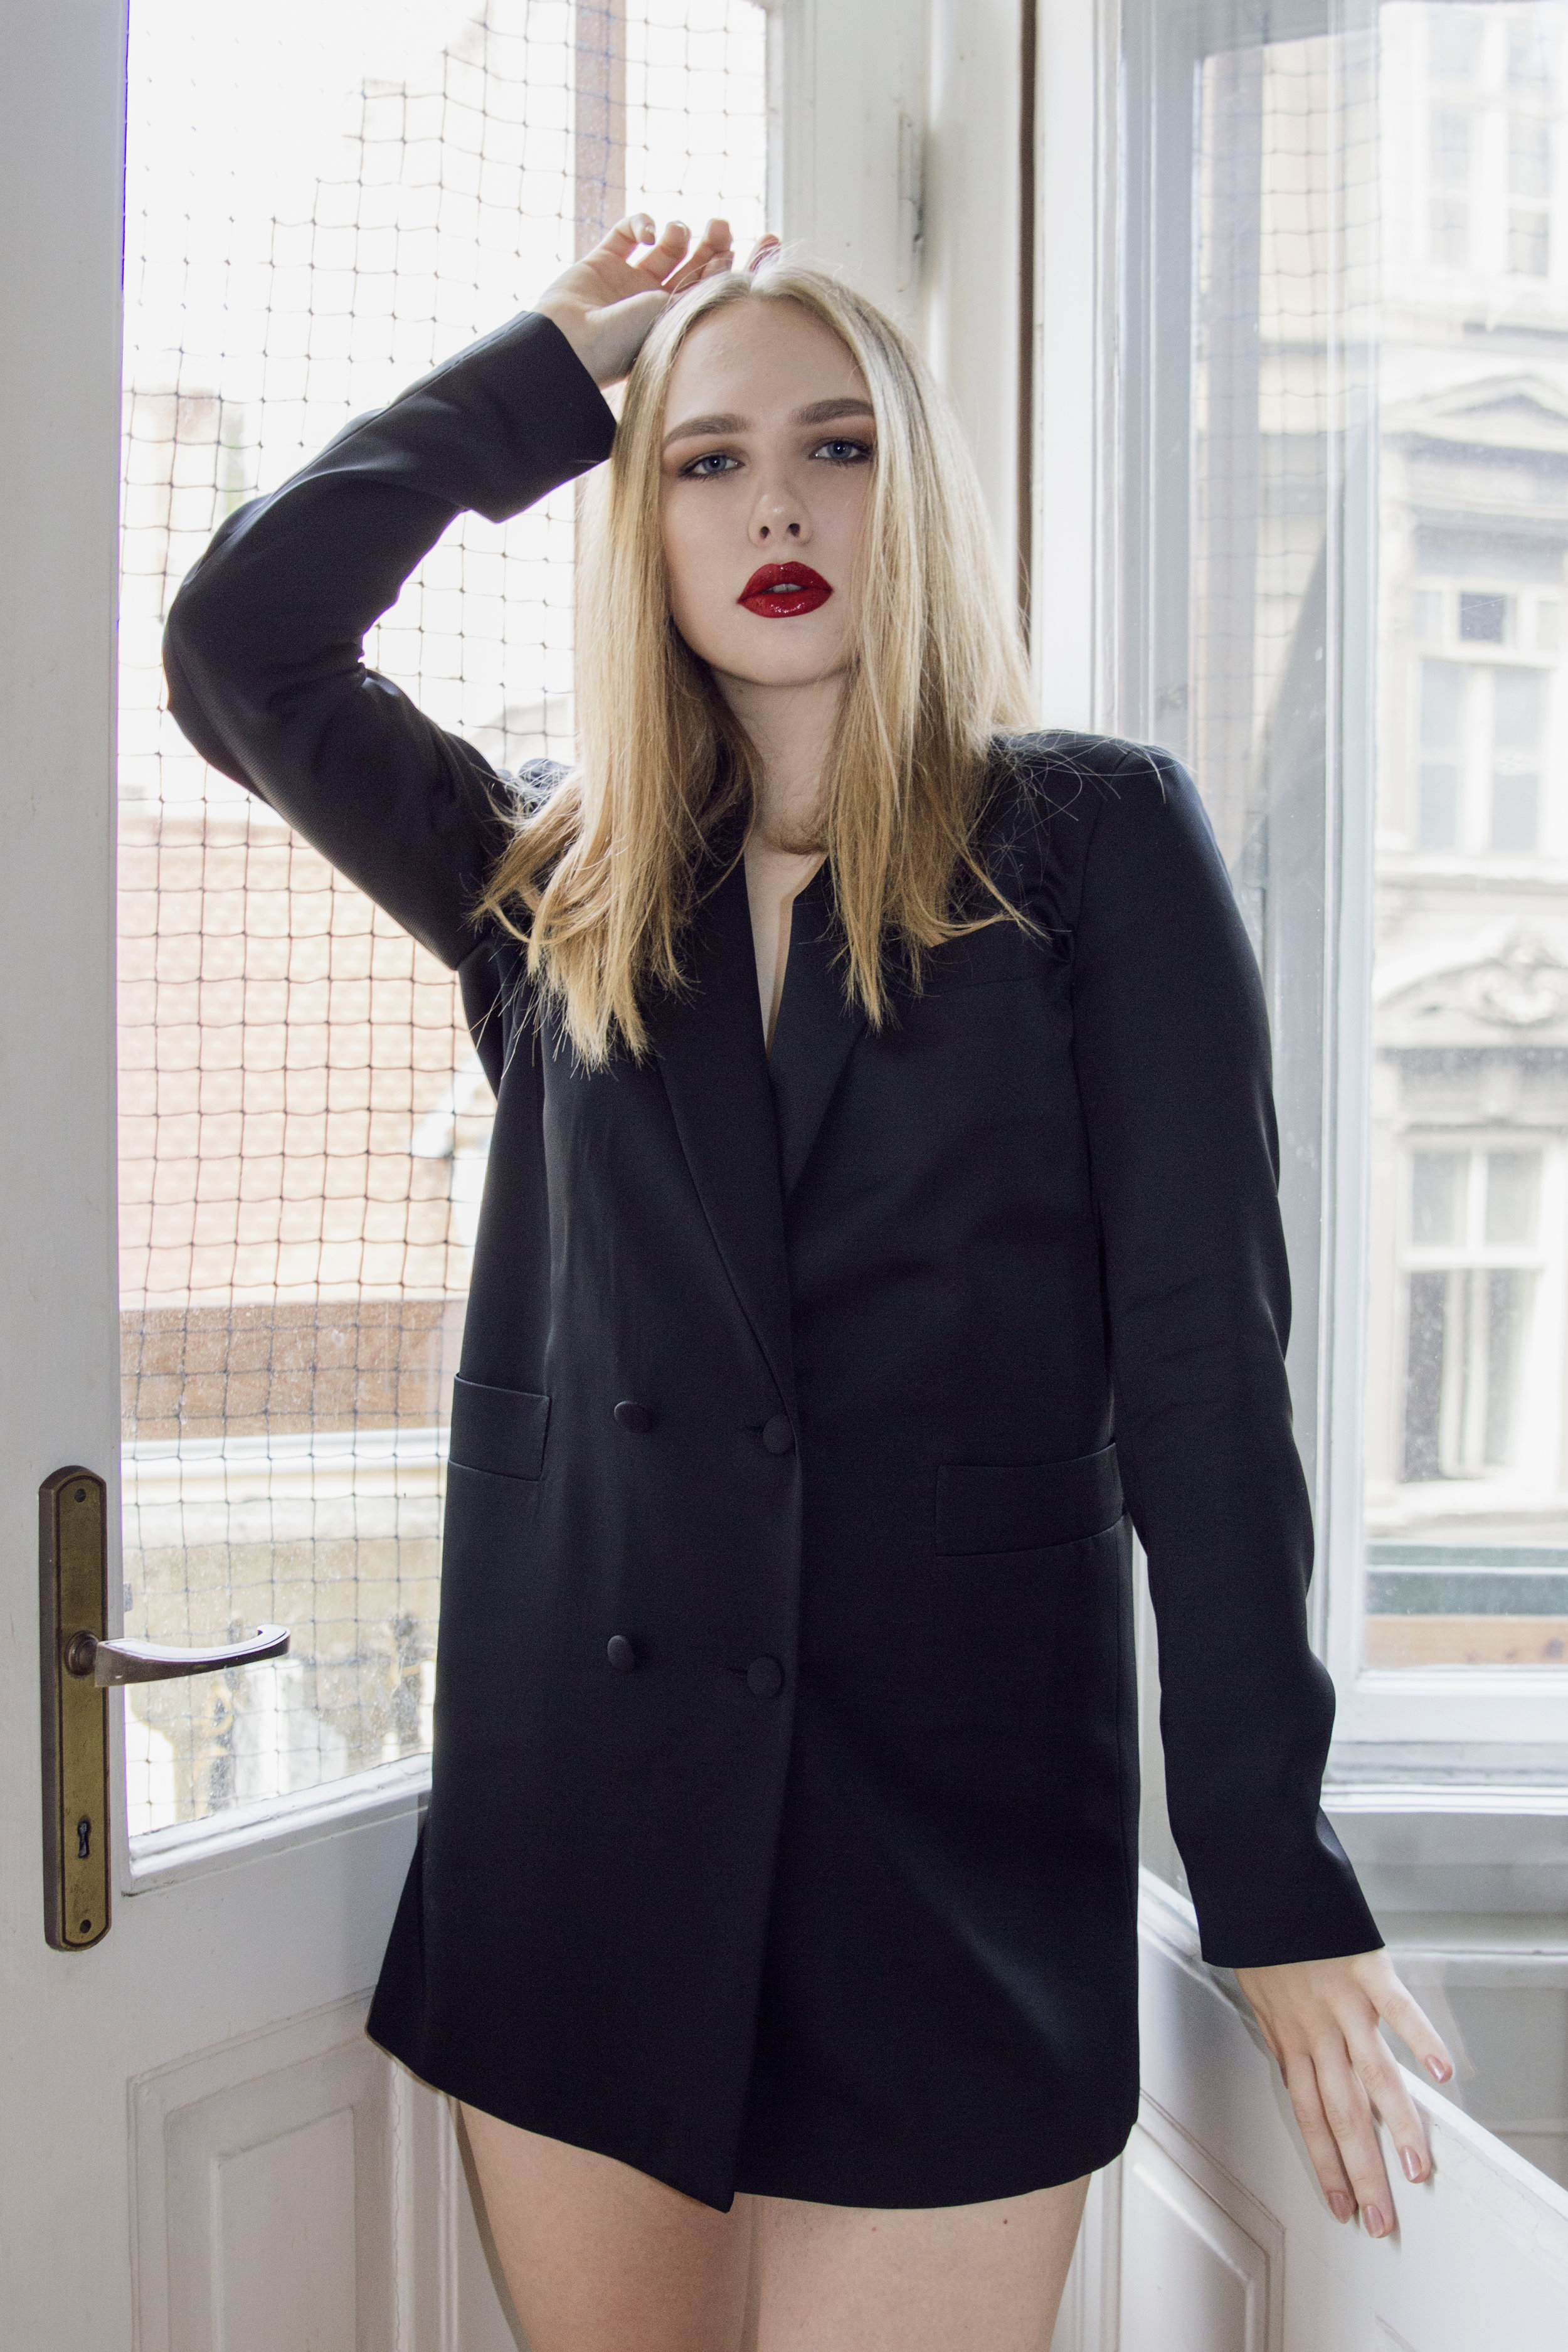 luka-lajic-fashion-photography-zagreb-croatia-mateyaneira-croatian-designer (5).jpg